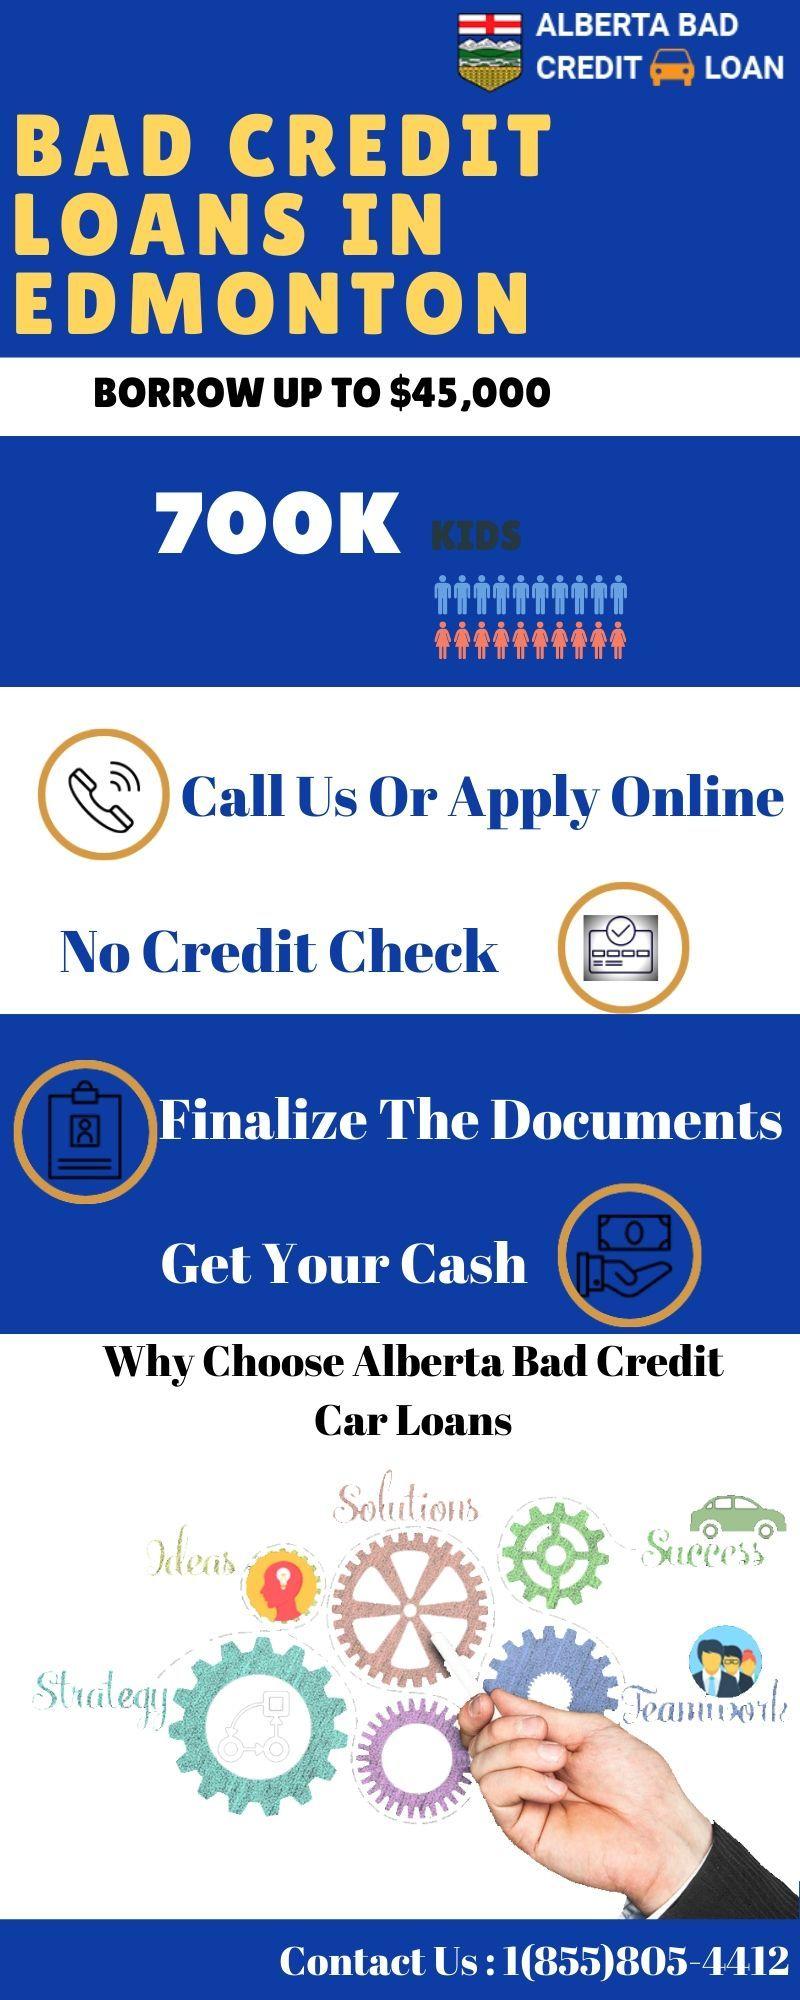 Bad Credit Car Loans In Edmonton Quick Approval Bad Credit Car Loan Car Loans Credit Cars